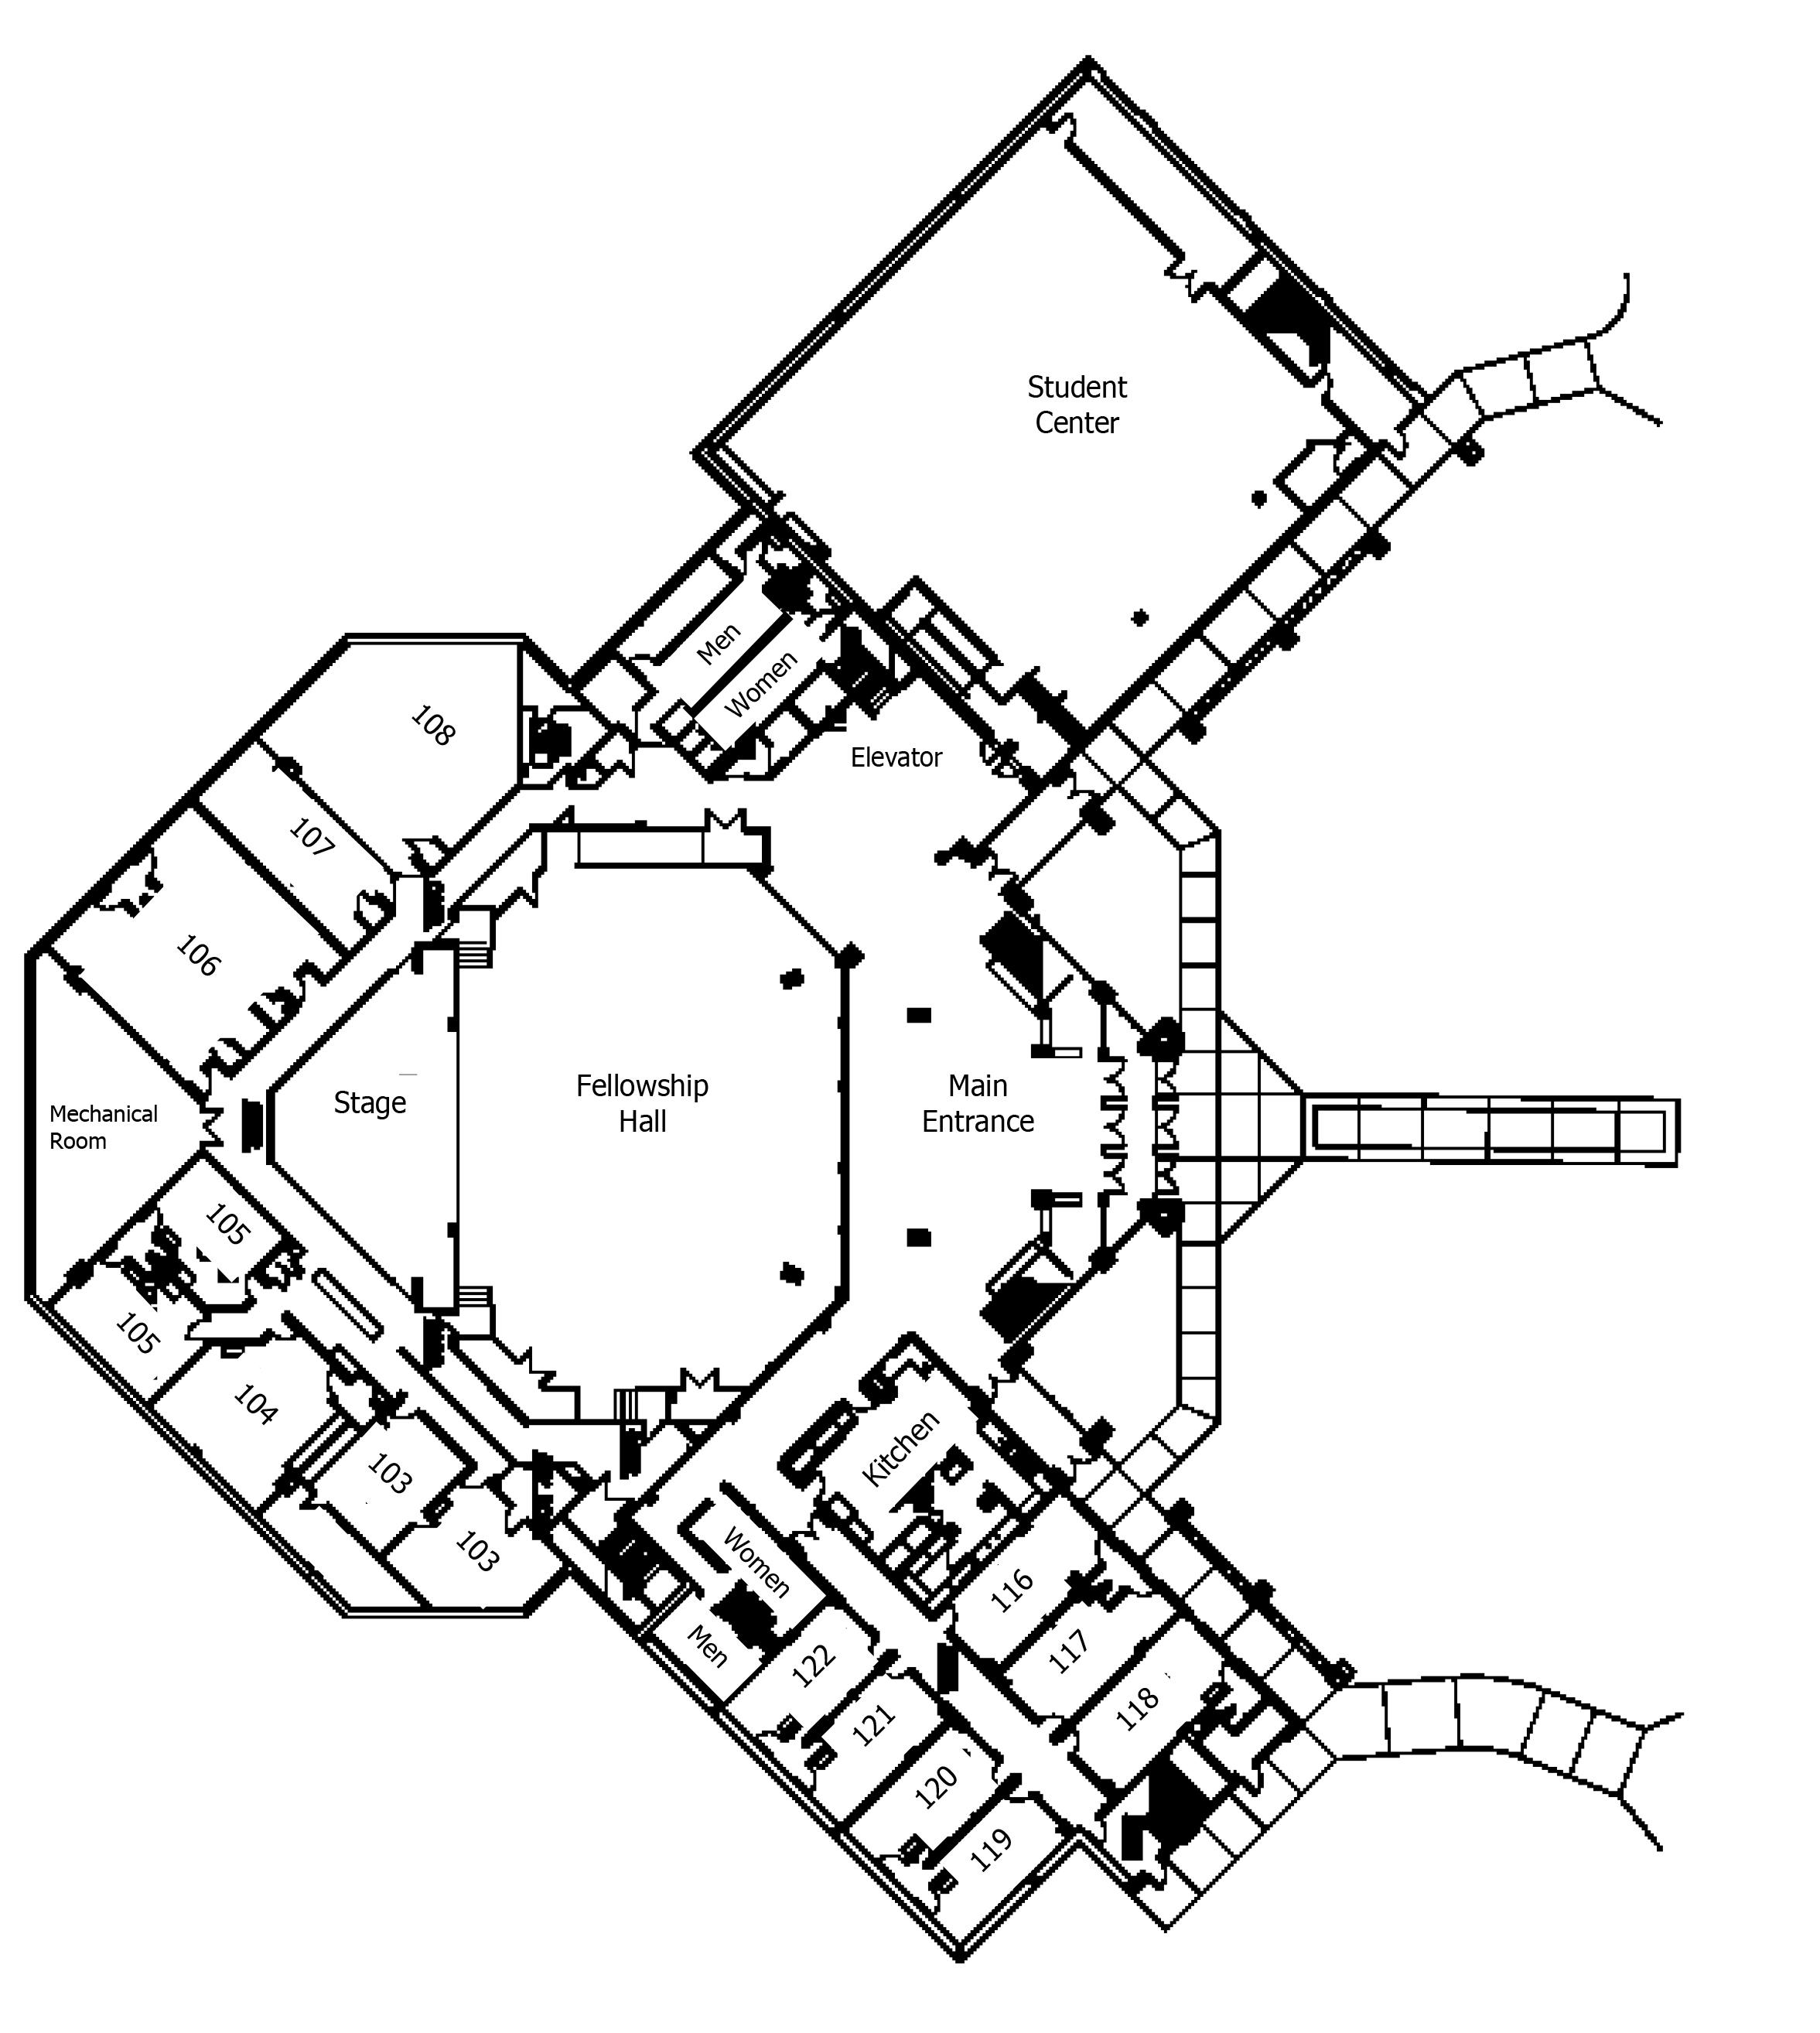 facility-map-2.jpg